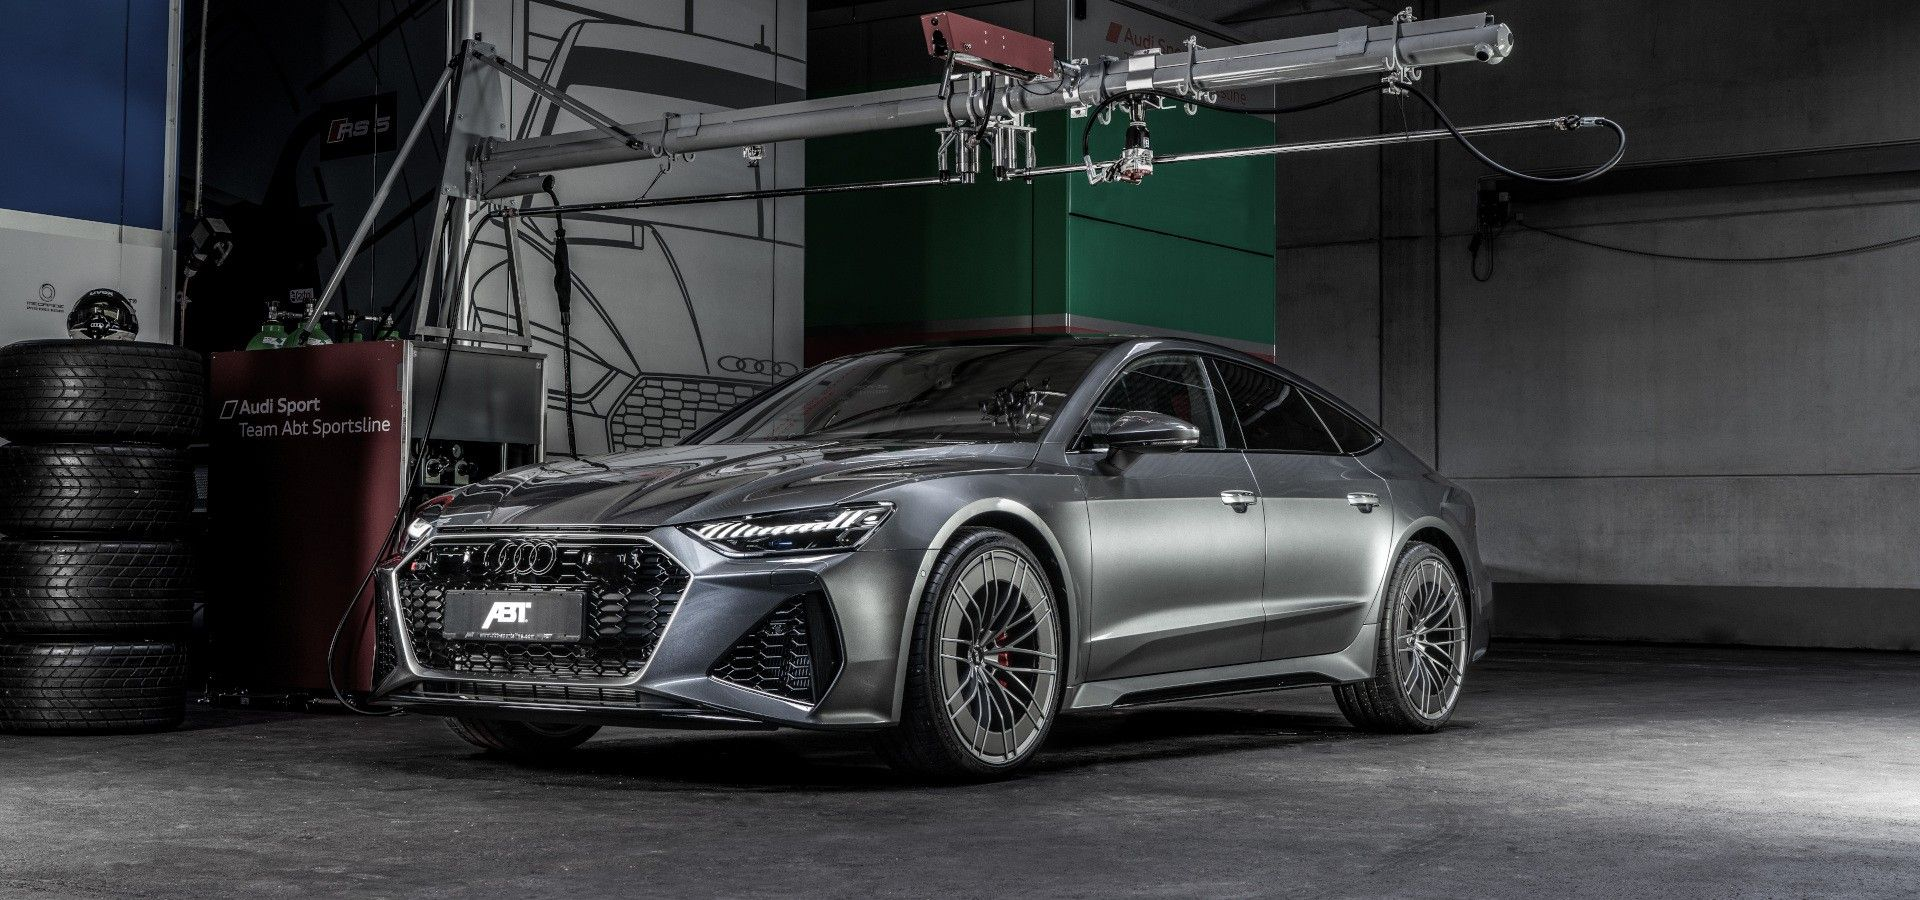 Audi Rs7 Abt Audi Audi Rs Hd Wallpaper